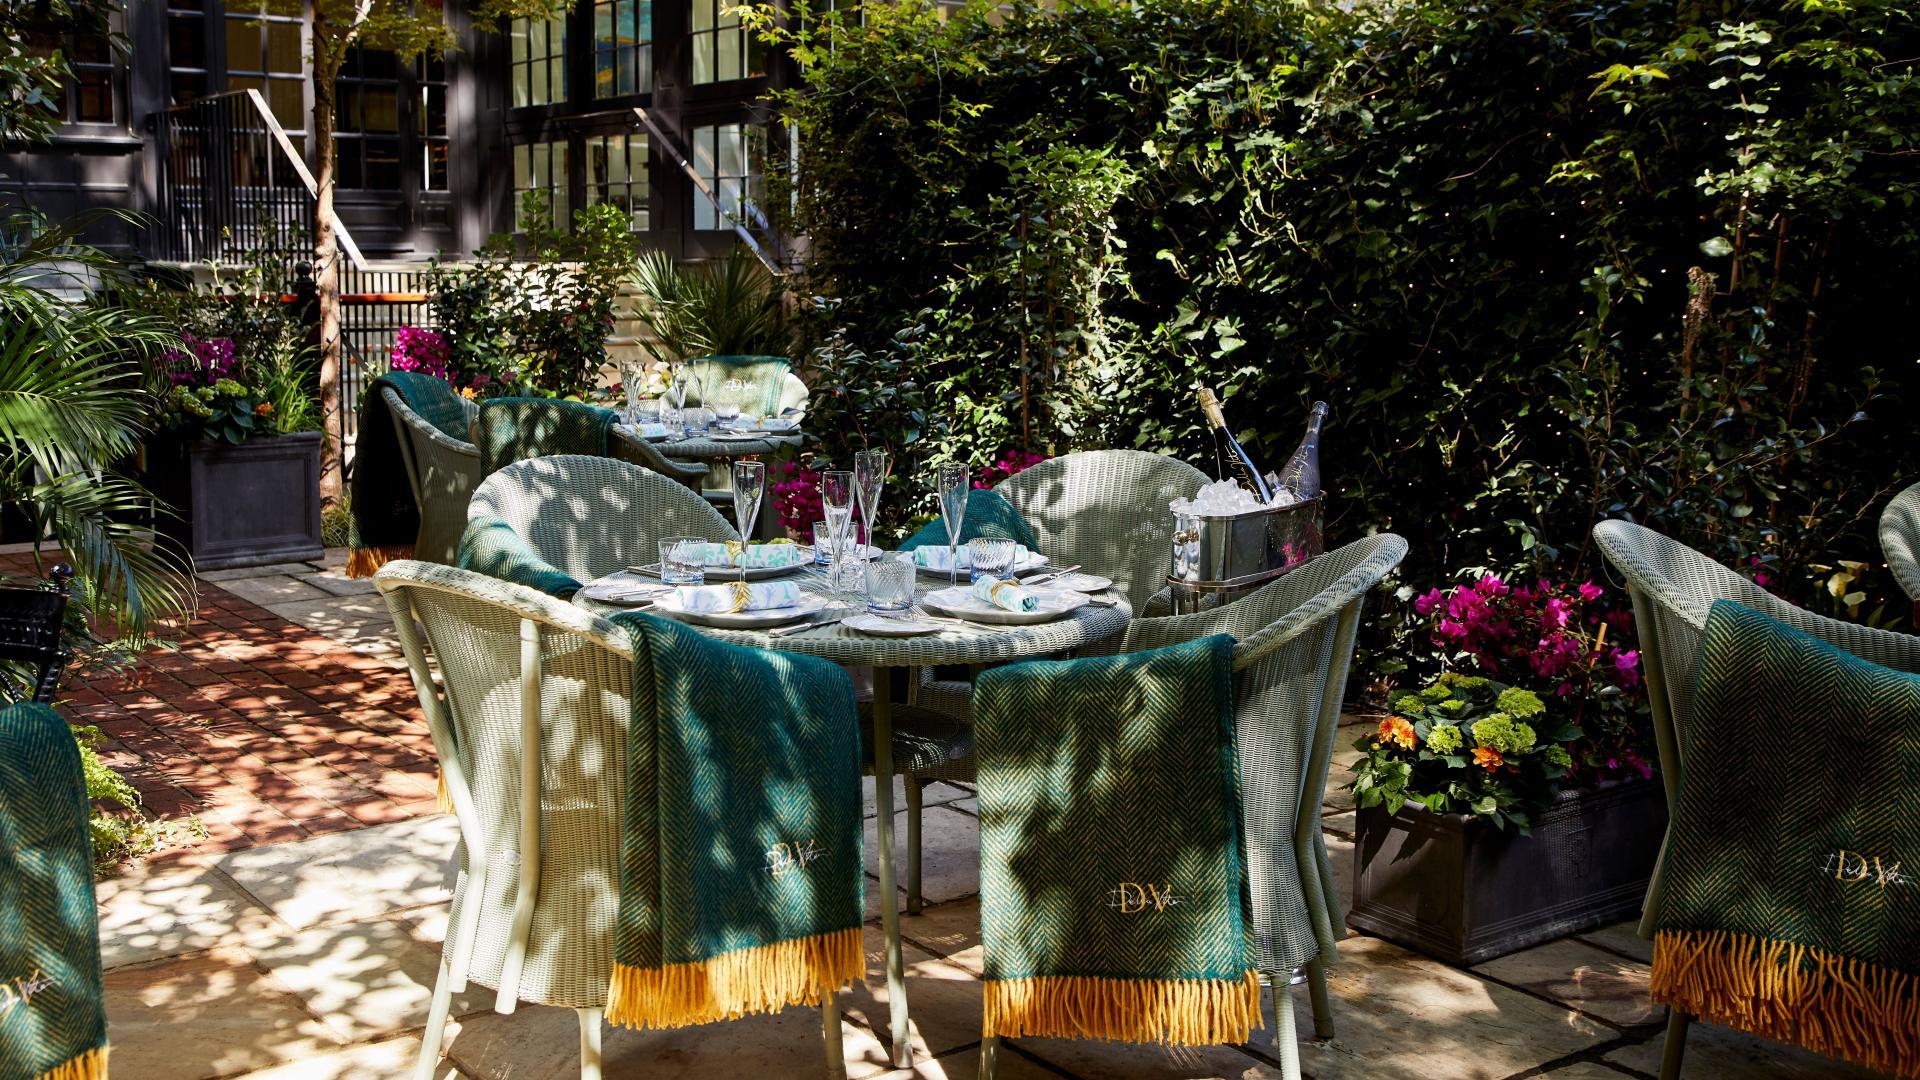 Summer events London 2021: Della Vite terrace at The Goring